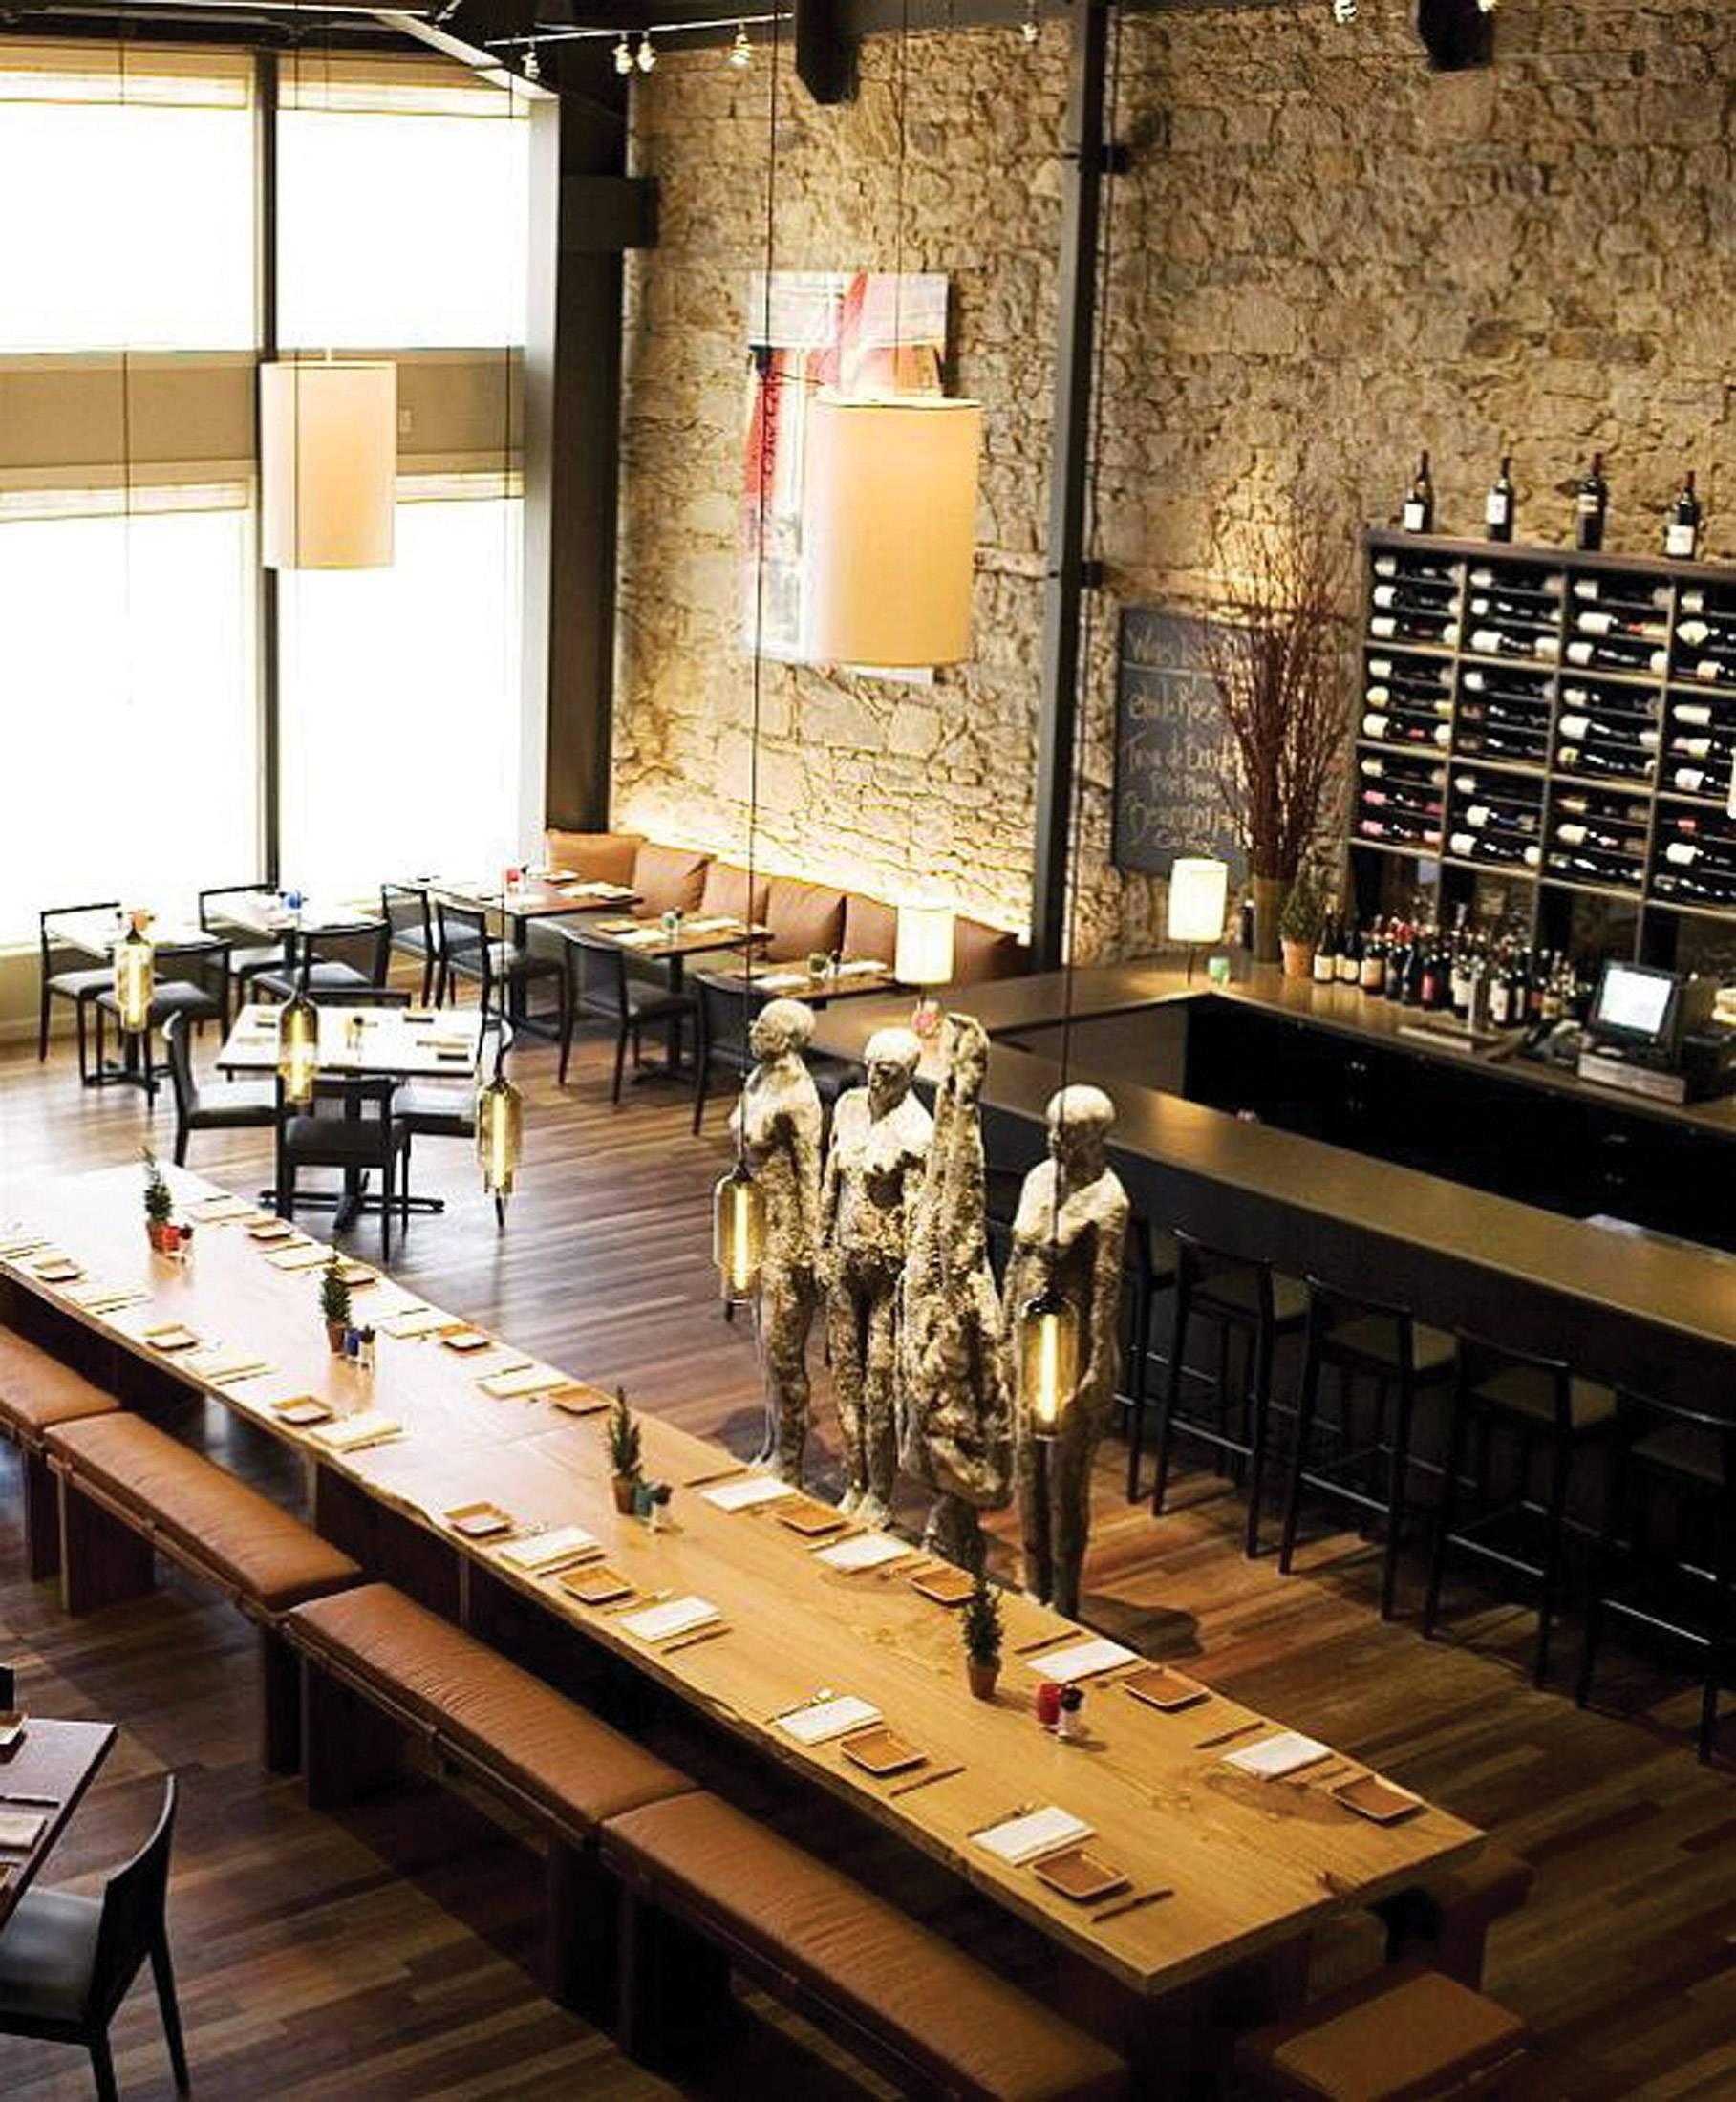 Charming Modern Restaurant Lighting Fixtures Fixtures Light inside Restaurant Lighting Fixtures (Image 3 of 15)